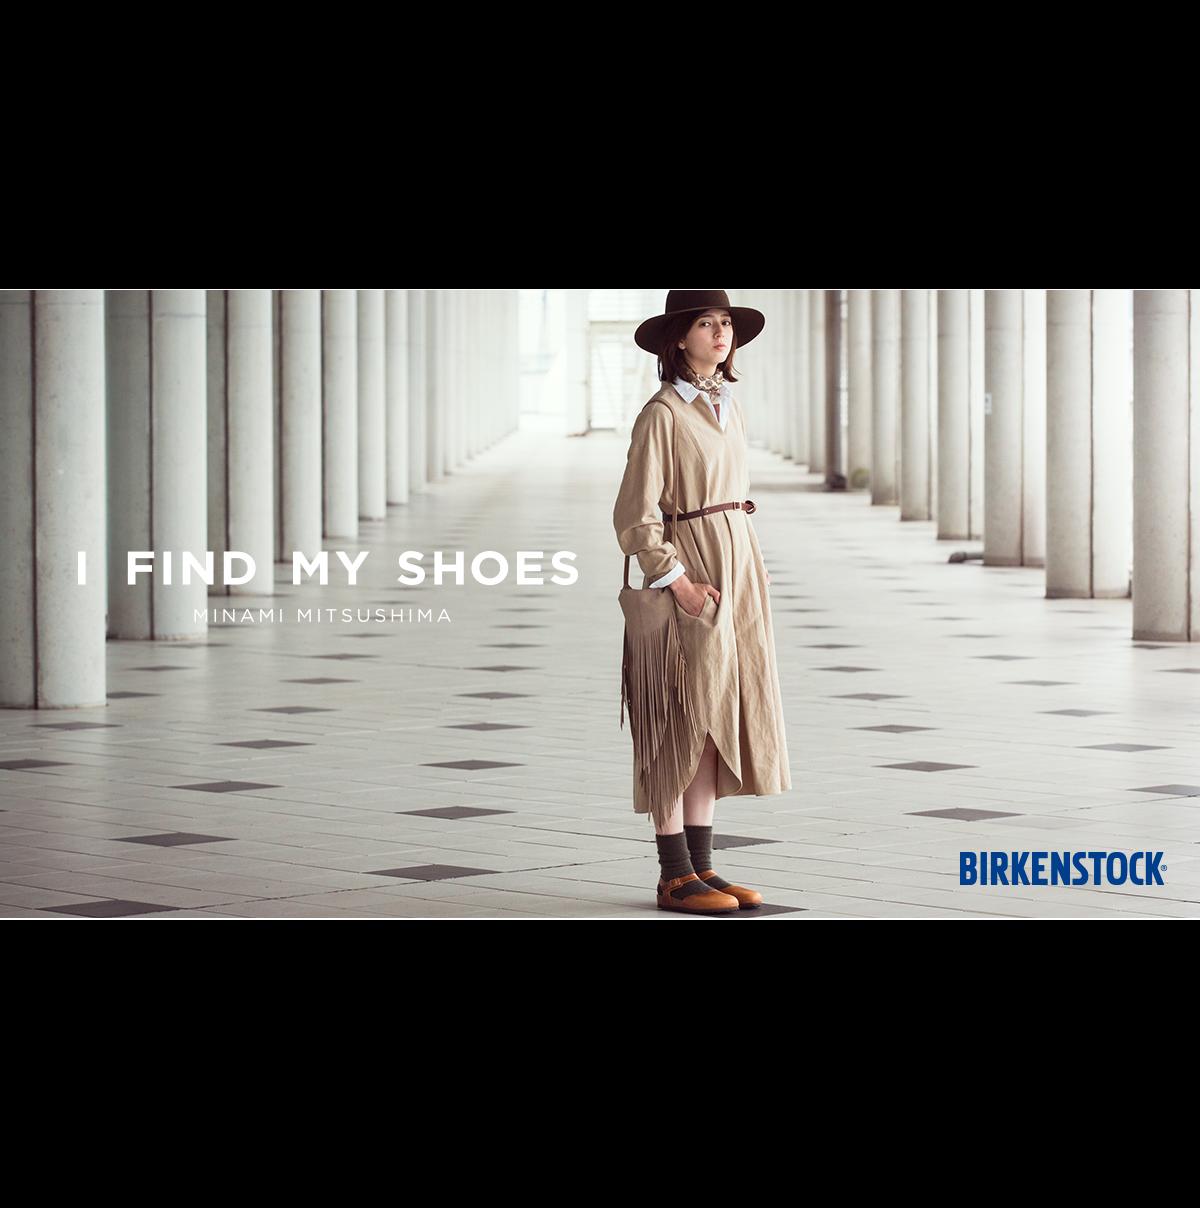 BIRKENSTOCK / I FIND MY SHOES5